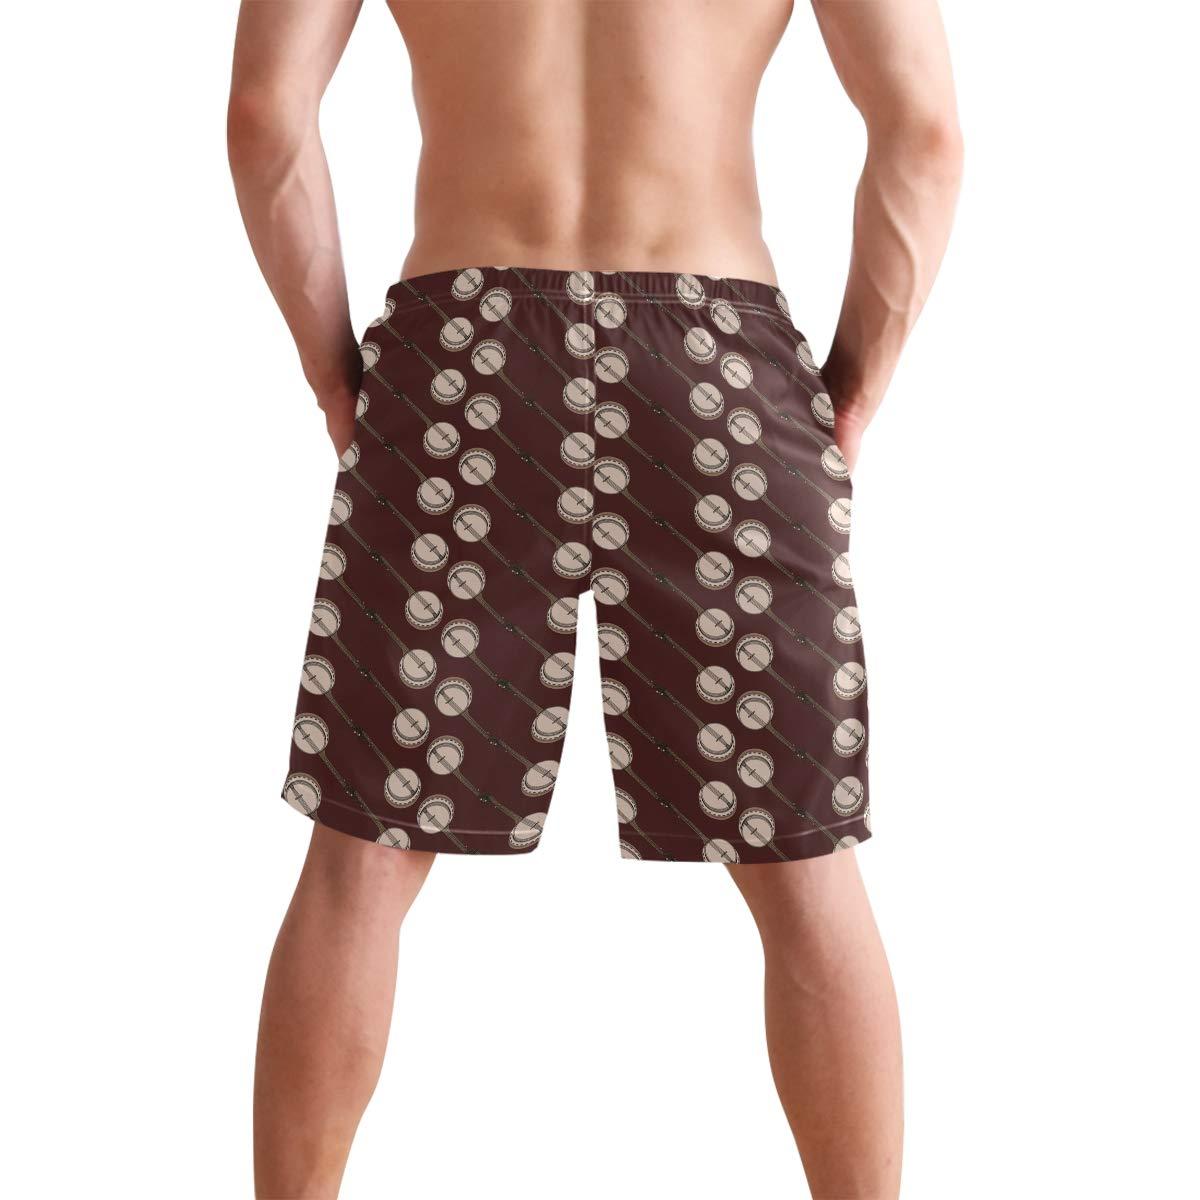 DongDongQiang Men Summer Banjo Musical Instrument Quick Dry Volleyball Beach Shorts Board Shorts